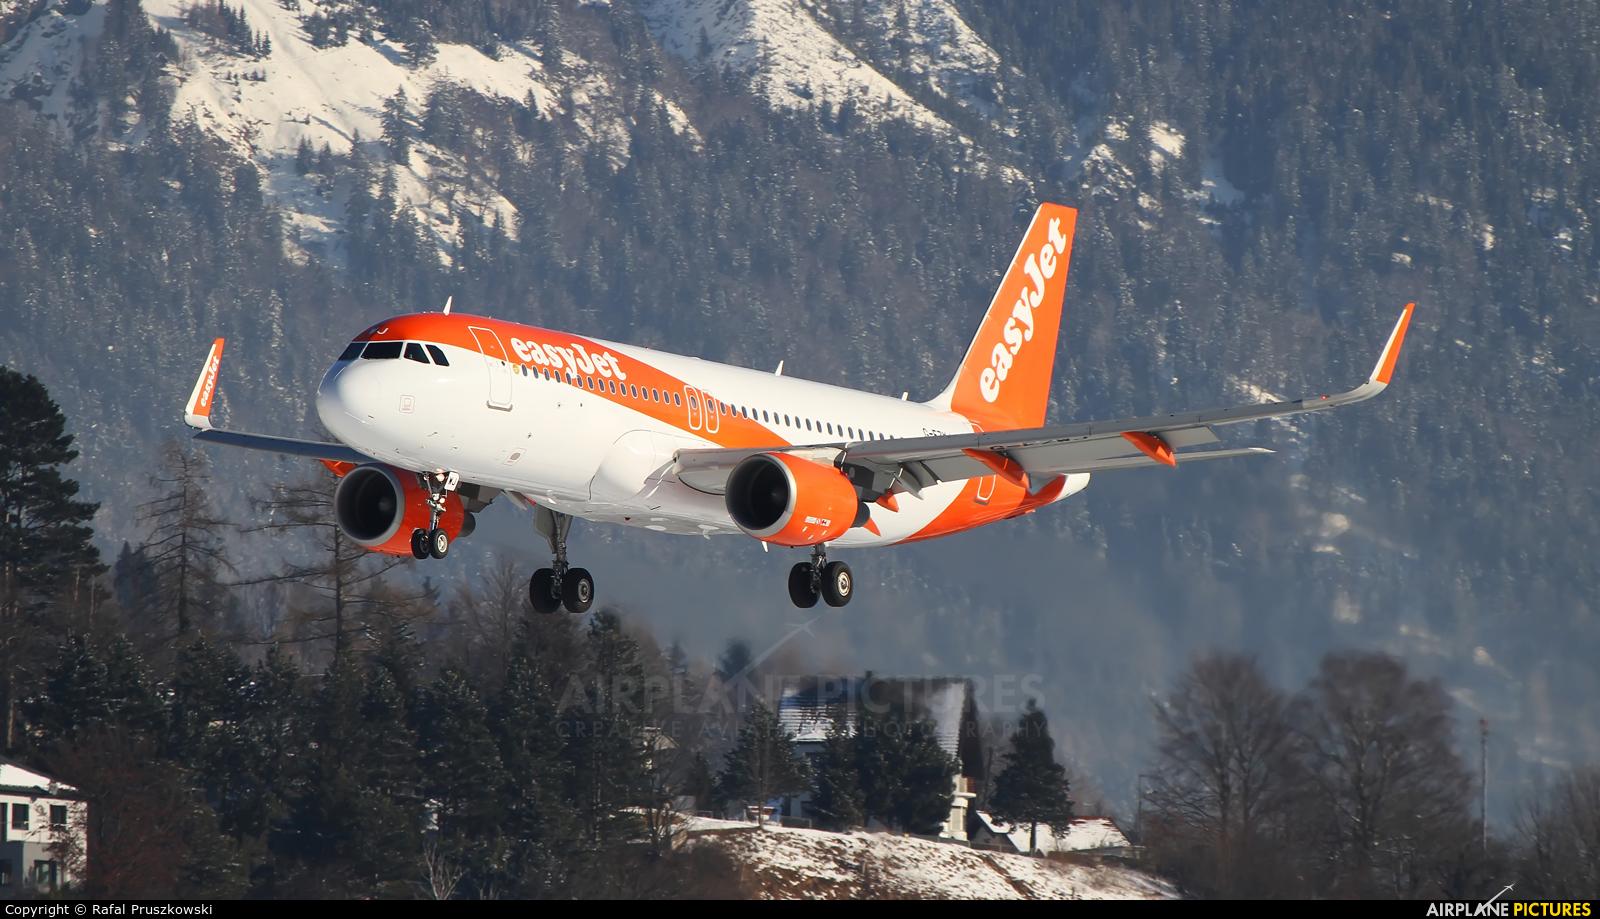 easyJet G-EZWJ aircraft at Innsbruck